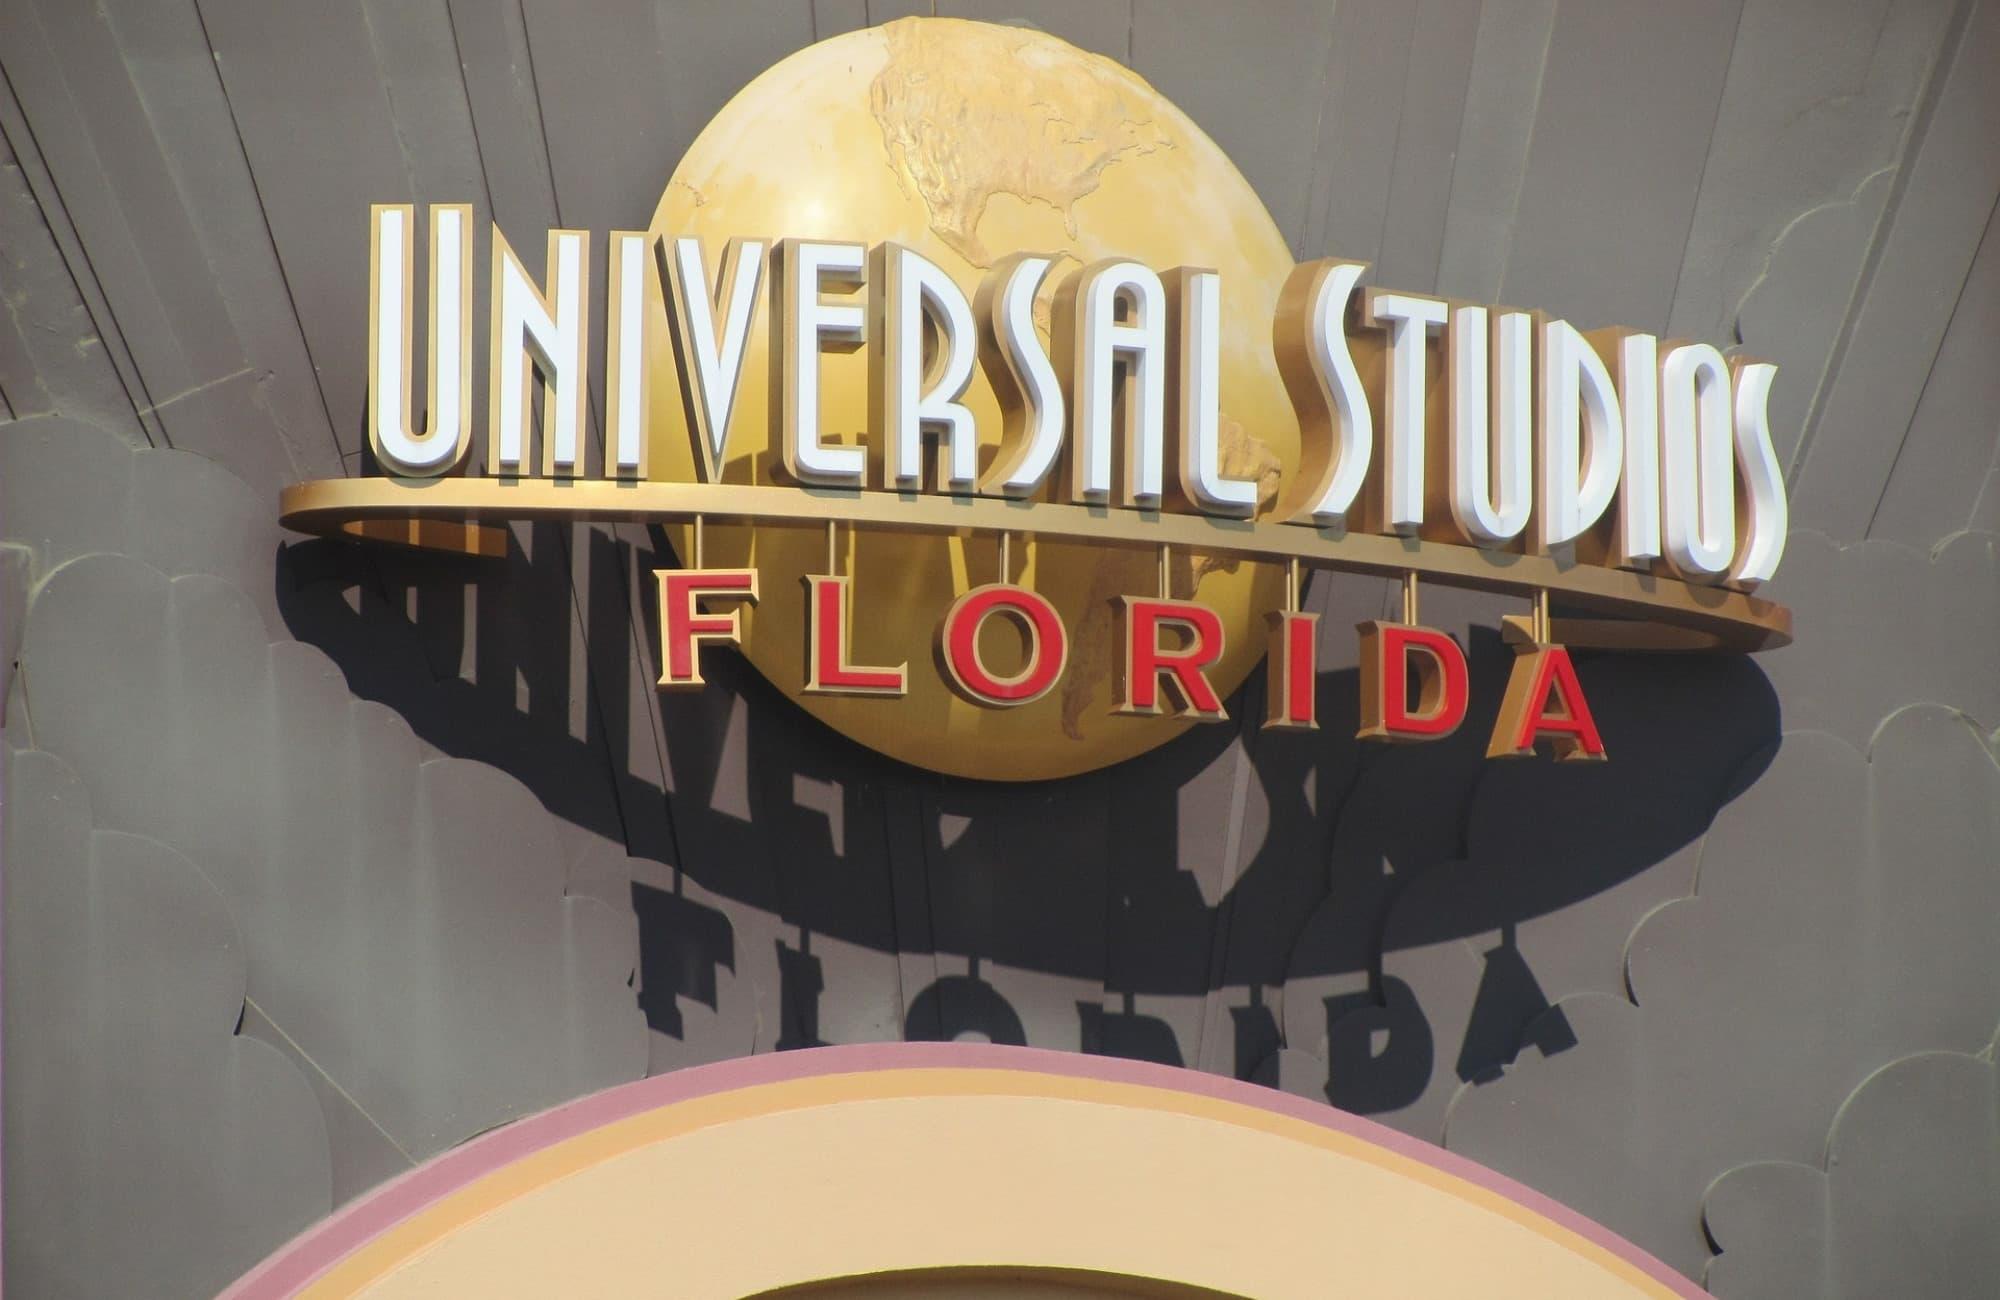 Voyages- Universal studio orlando-Amplitudes